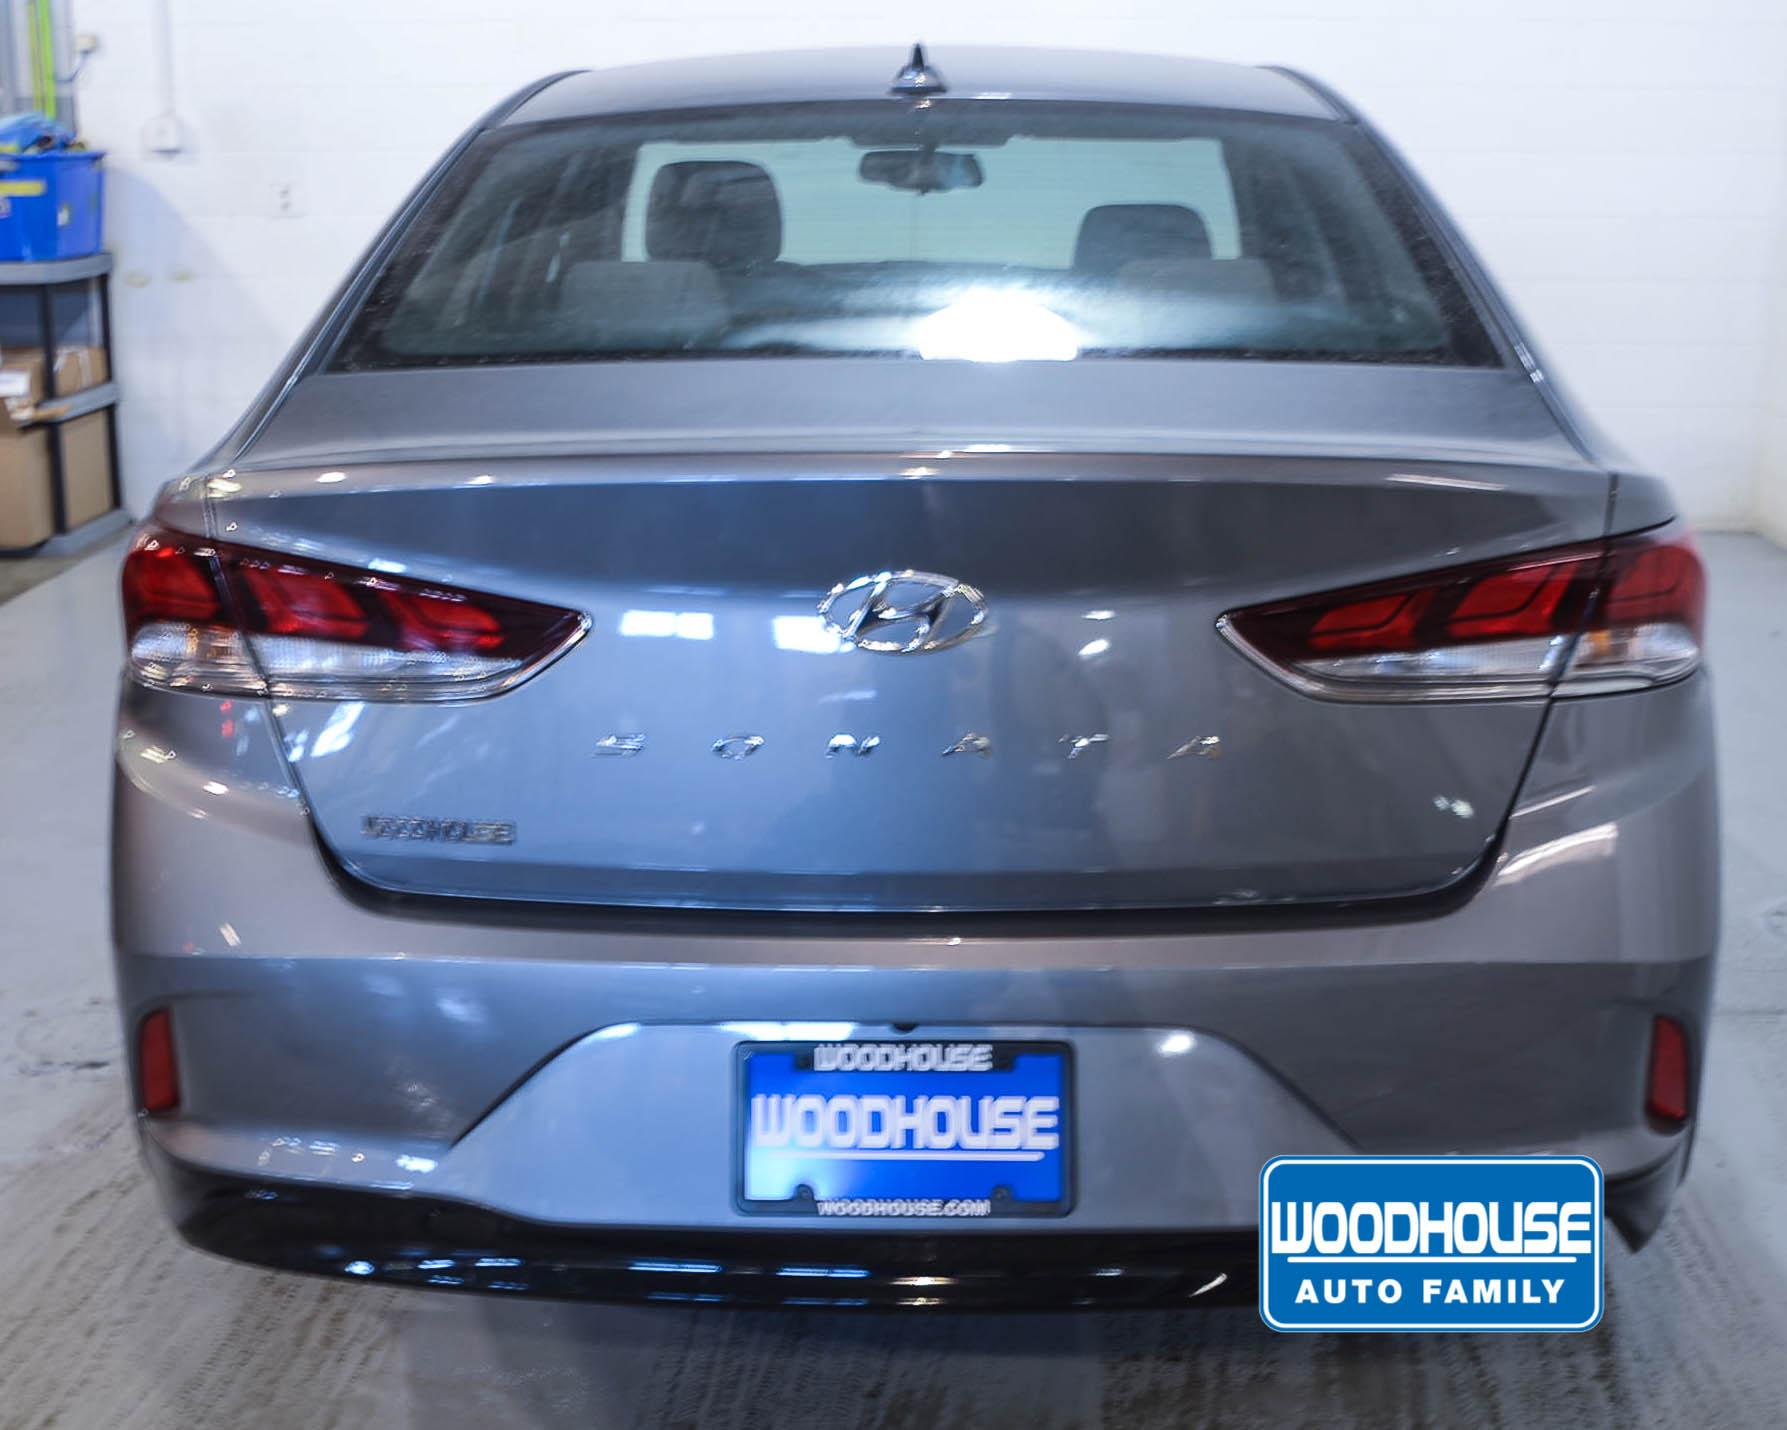 Hyundai Of Omaha Woodhouse Auto